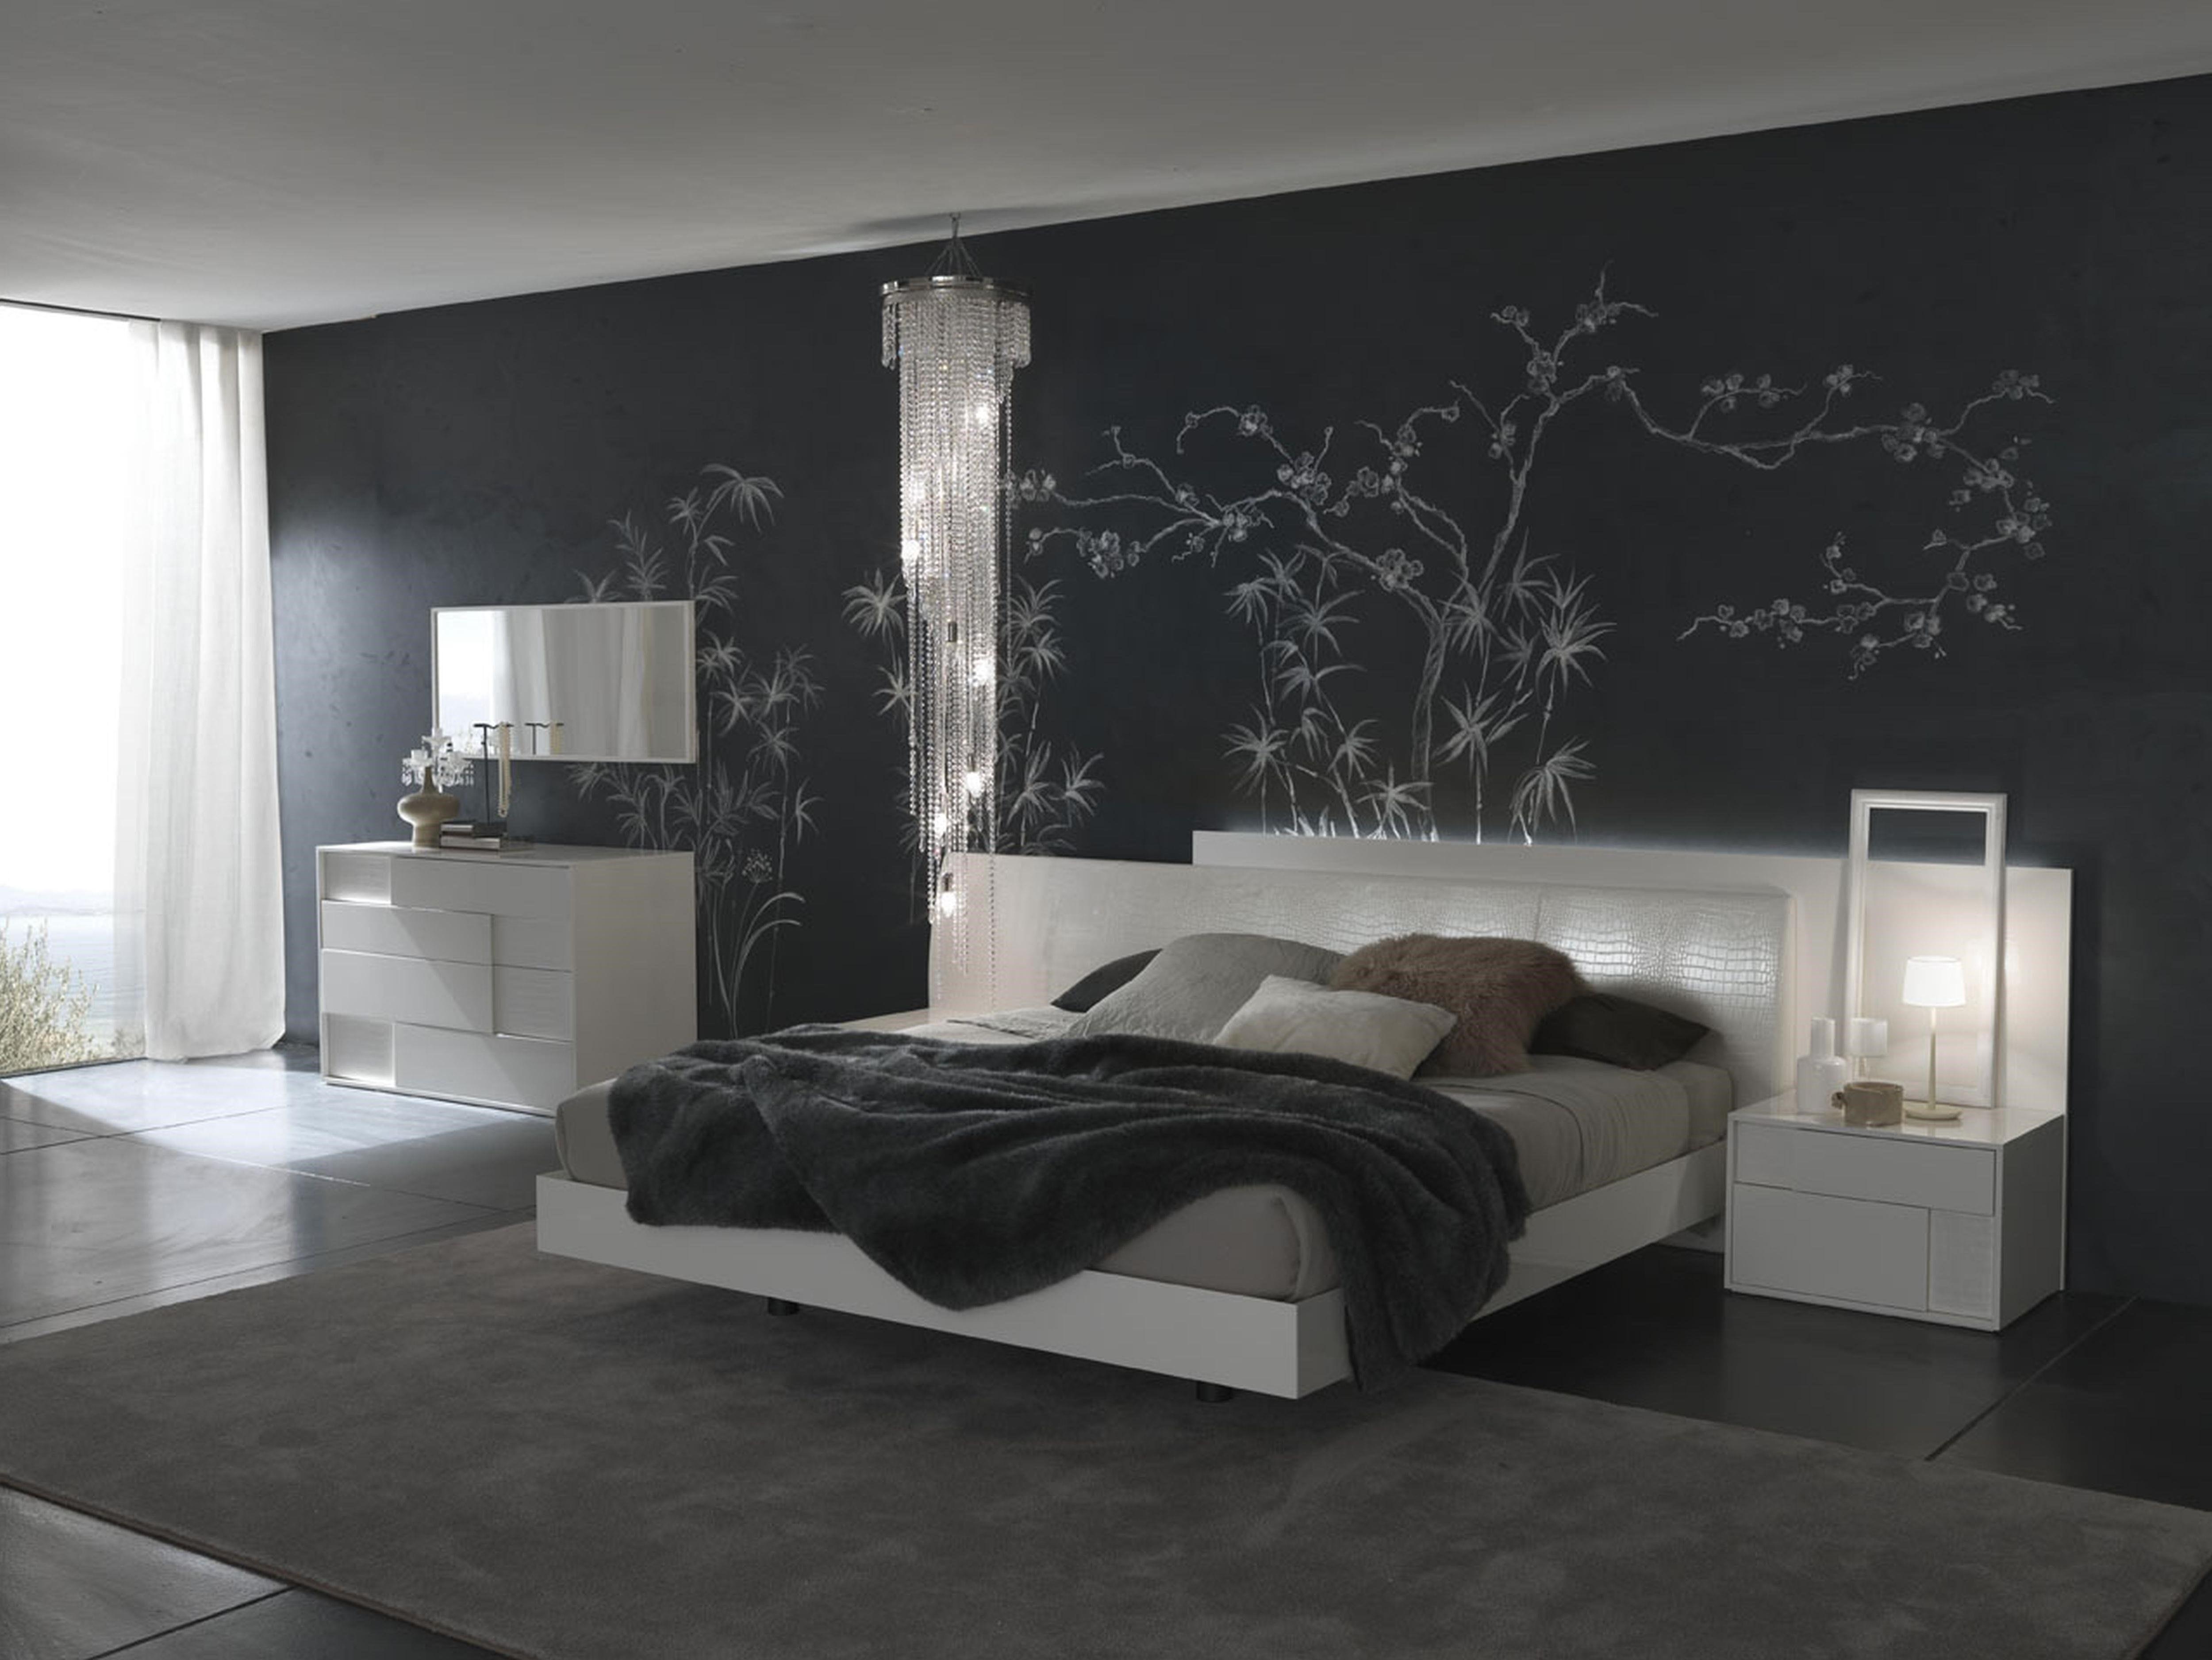 Bedroom Designs For Adults Modern Bedroom Designs For Young Adults Modern Home Design Elegant